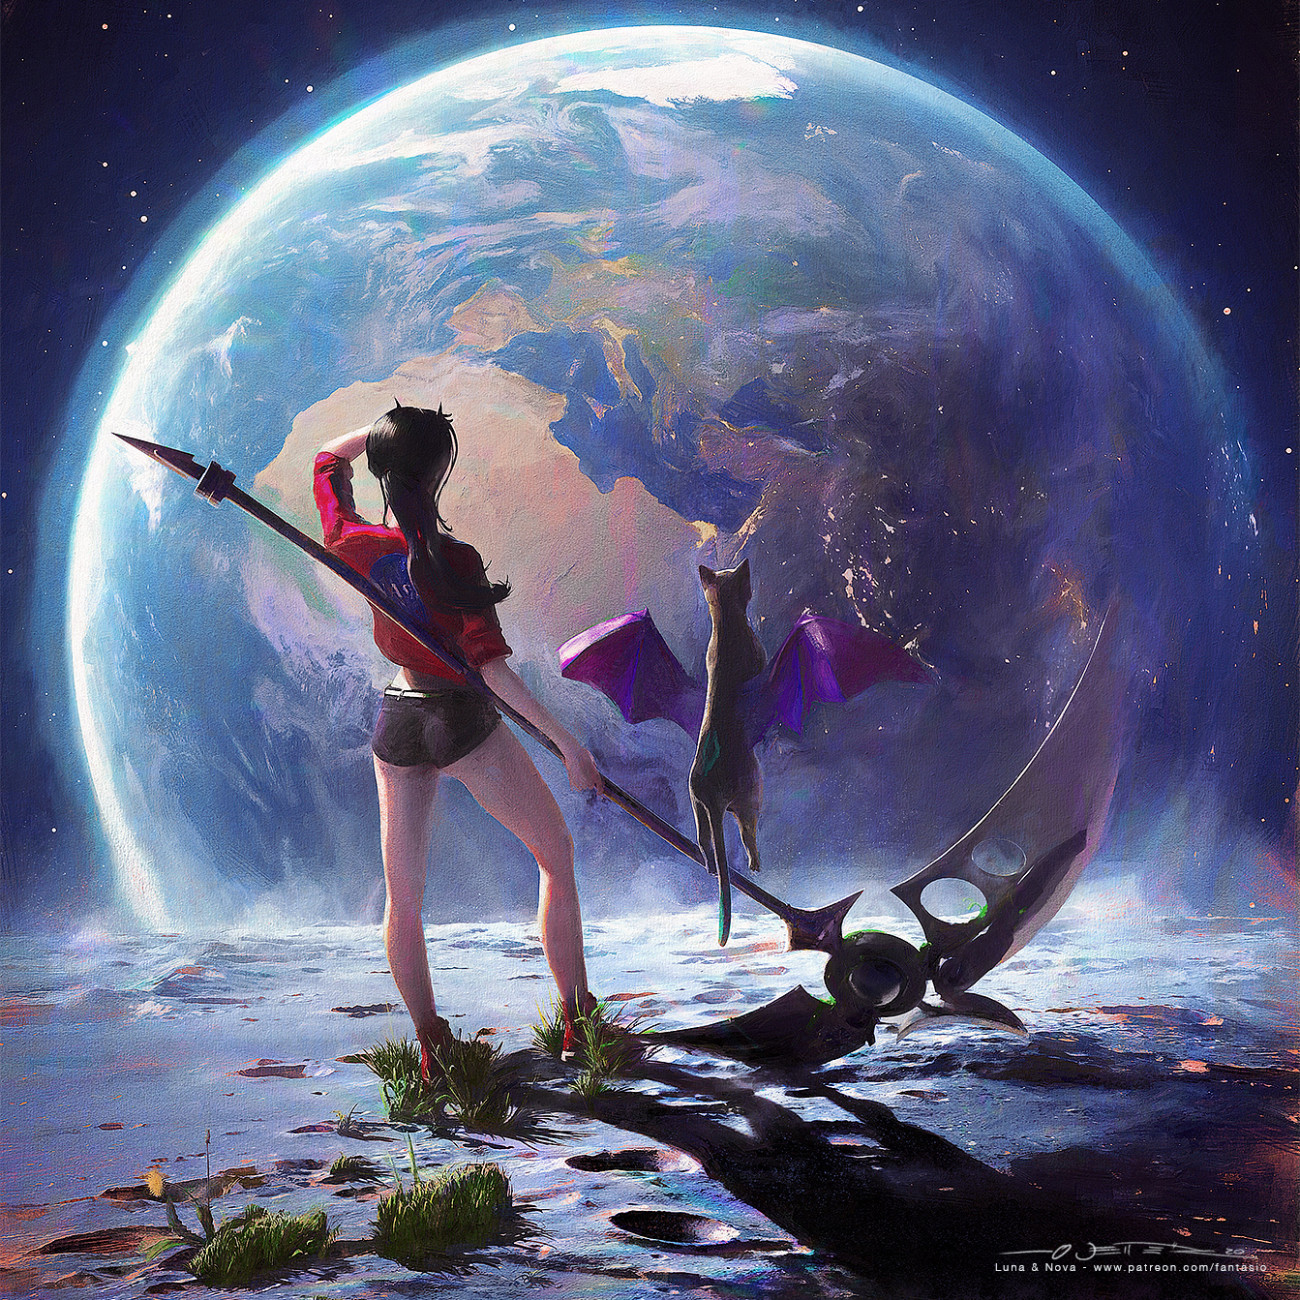 Ars Fantasio Oliver Wetter, Luna & Nova II